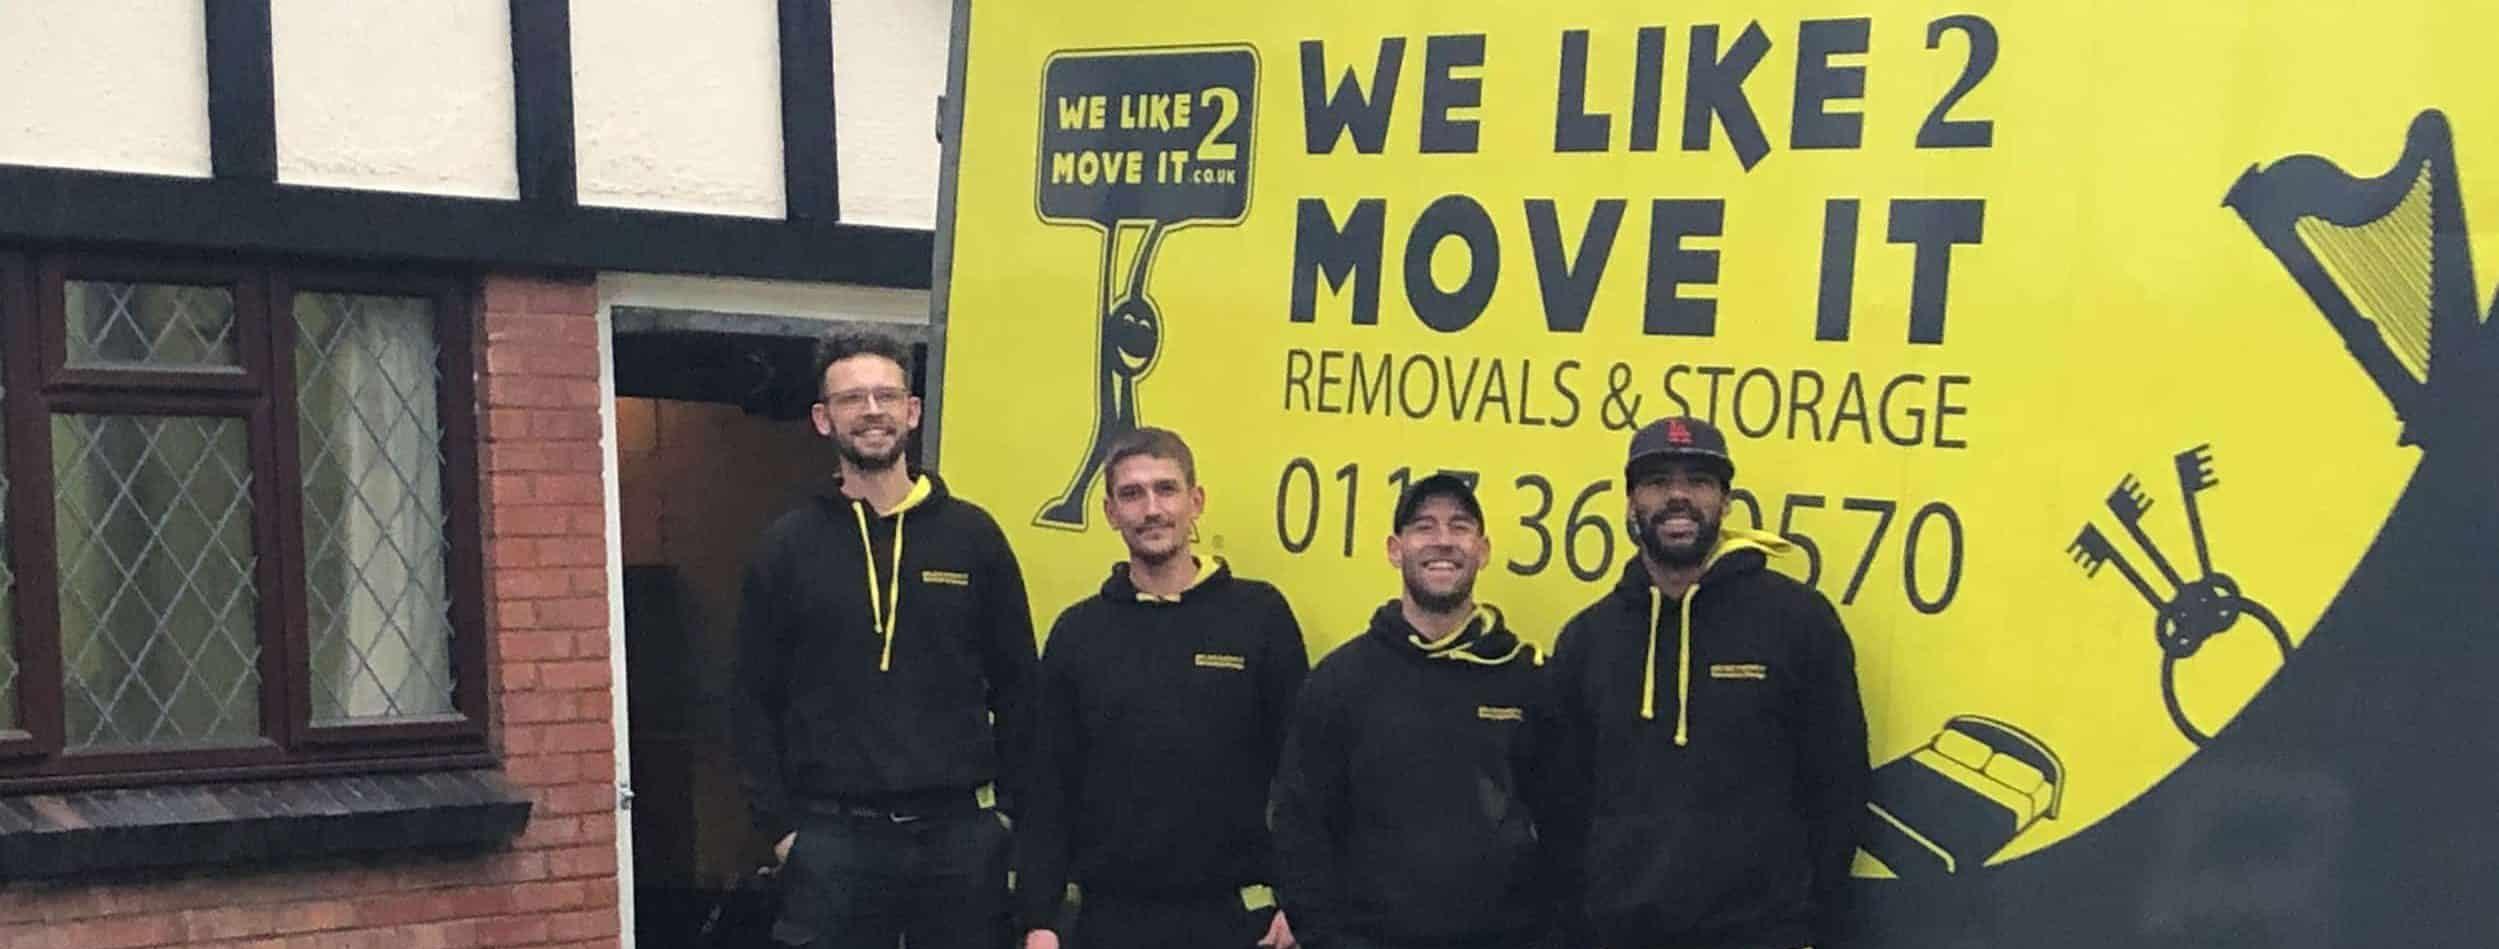 We Like 2 Move It Removals Bristol van